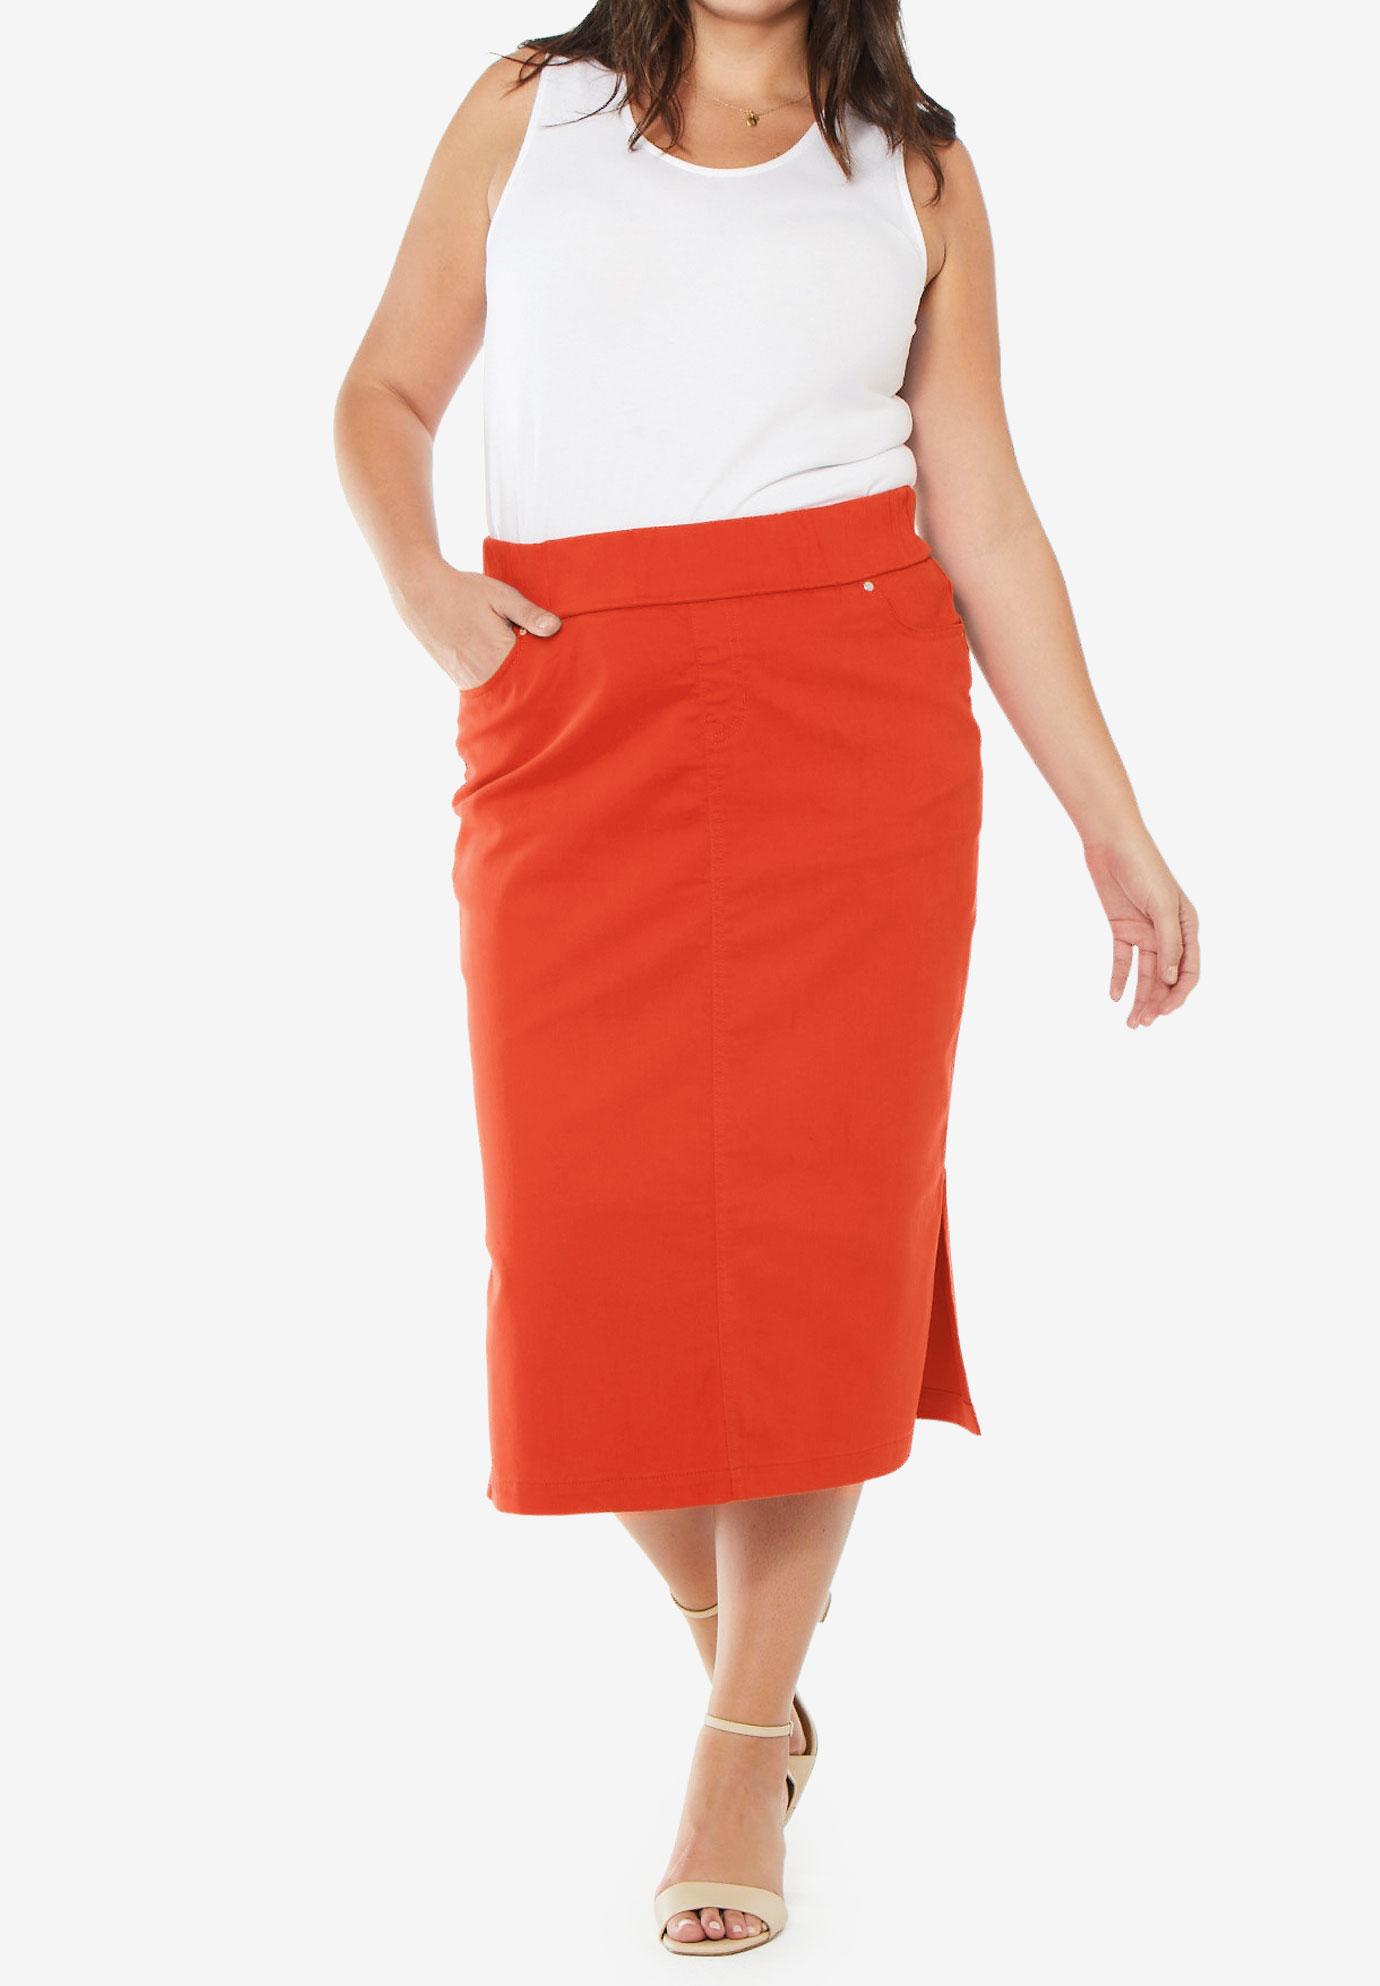 74b37ecbf6 Comfort Waist Midi Skirt| Plus Size Skirts | Jessica London